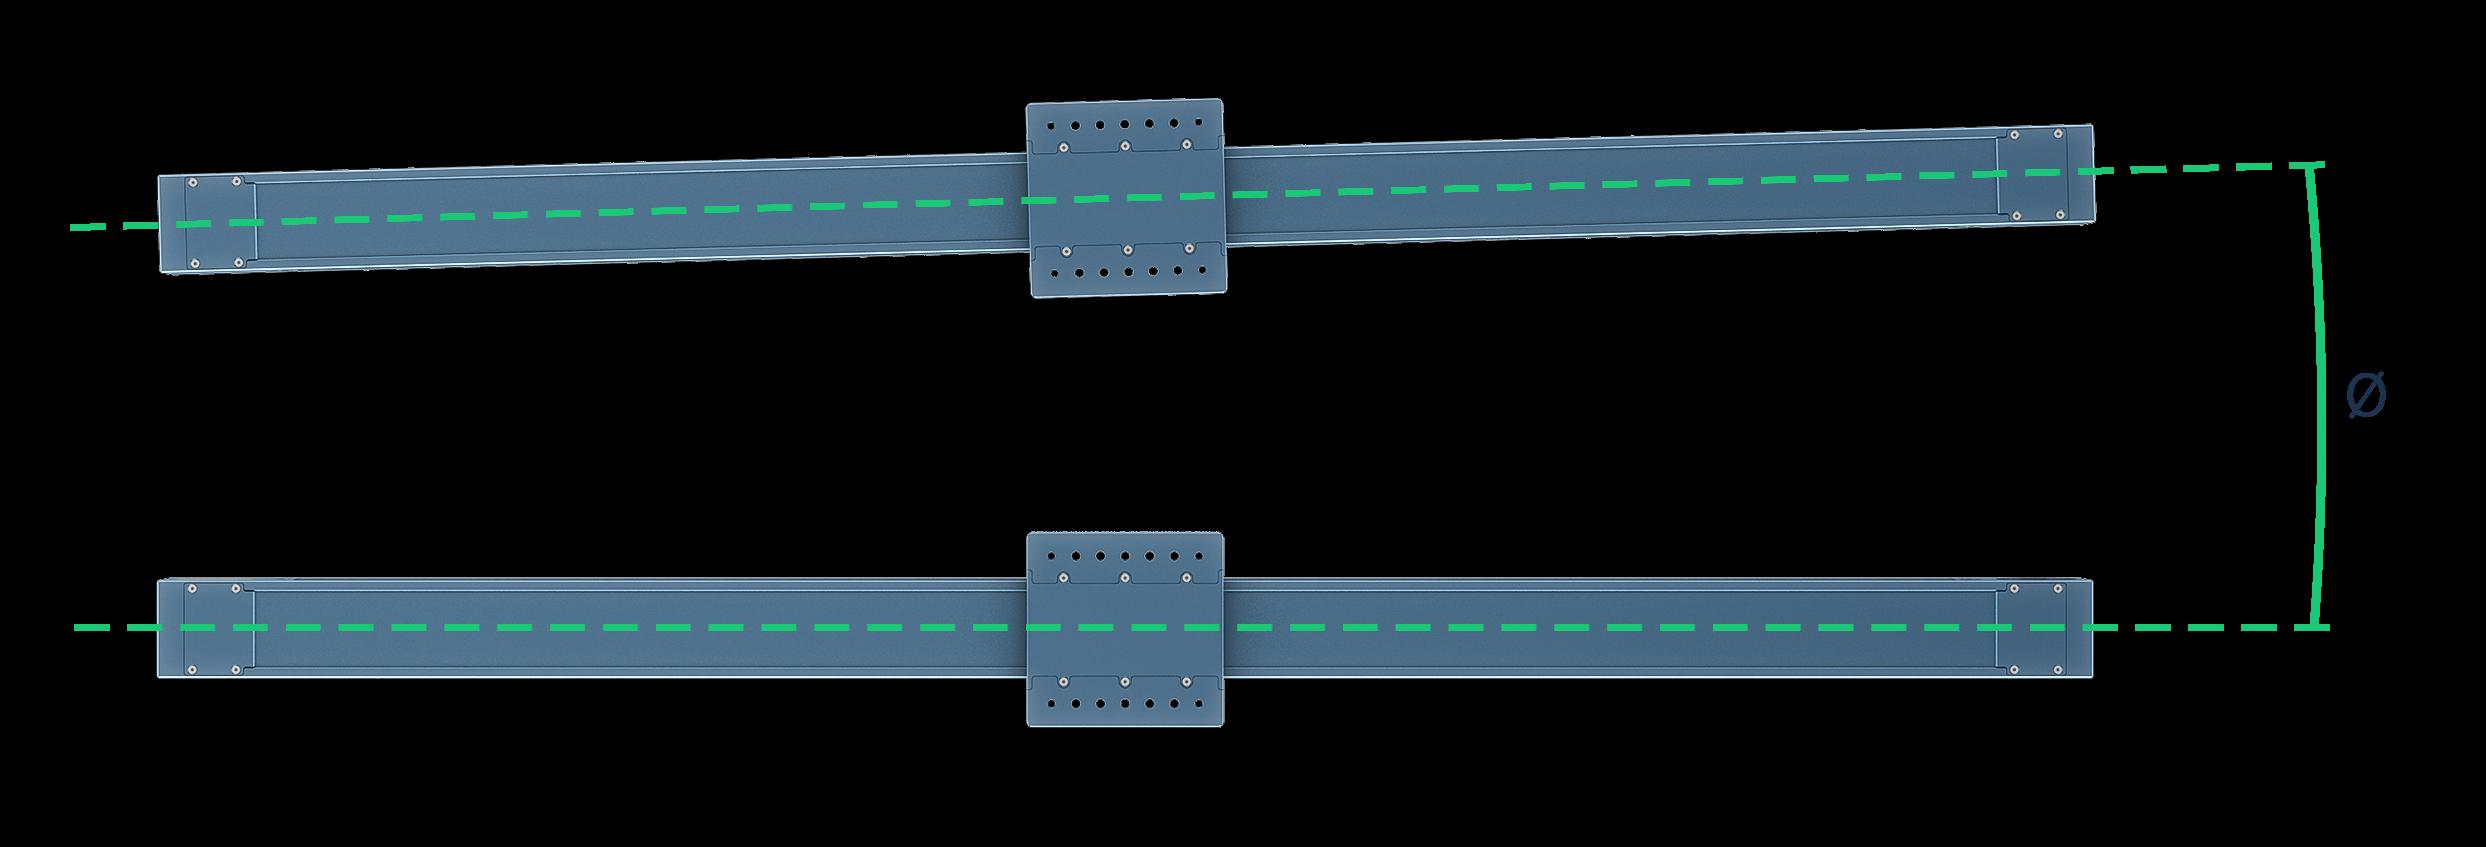 Figure 4: ϴ represents the angular misalignment from horizontal.